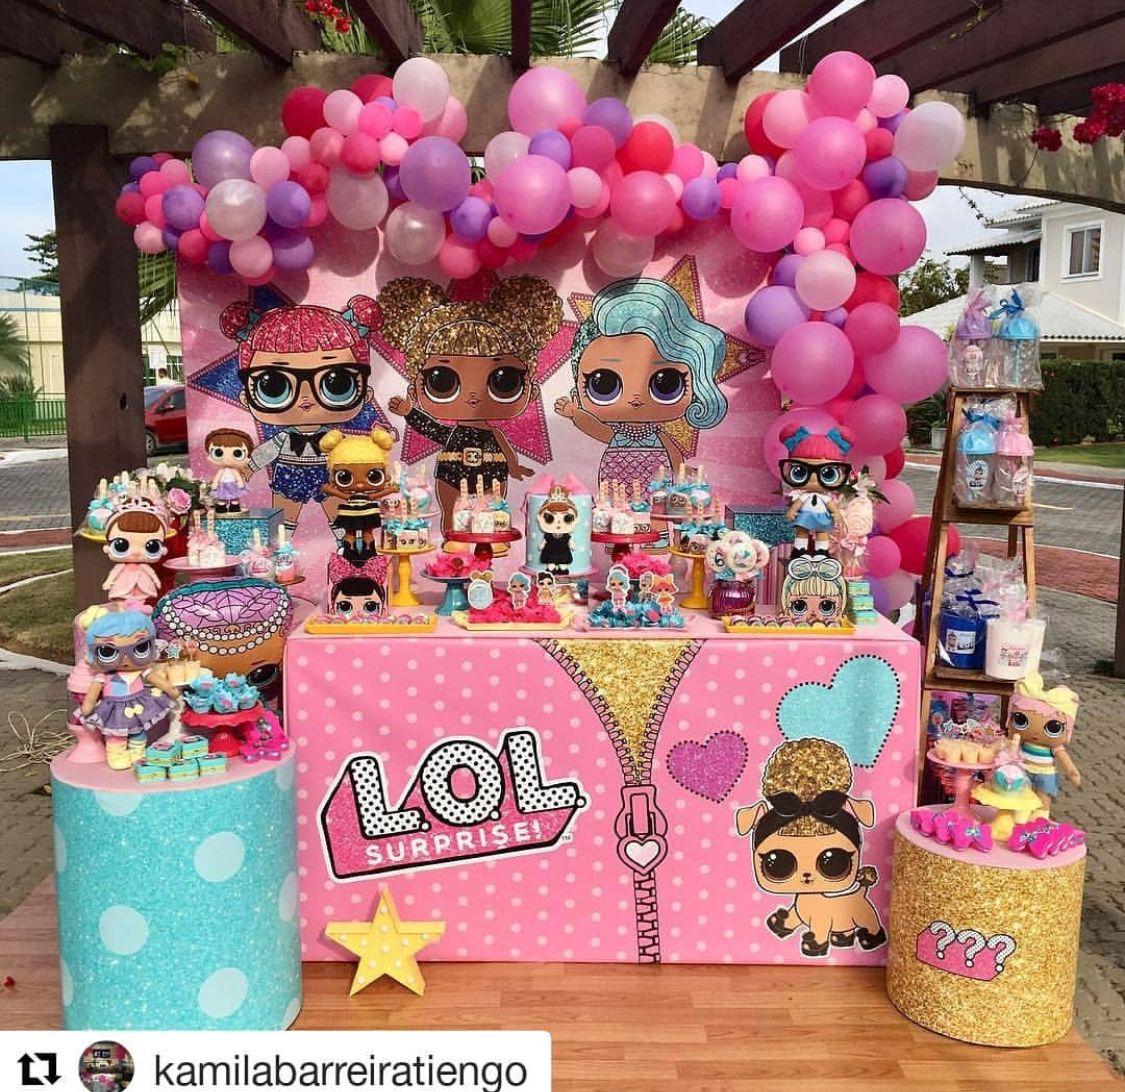 Lol doll balloons surprise arch kit balloon garland unicorn diy organic bi  party decorations also rh pinterest